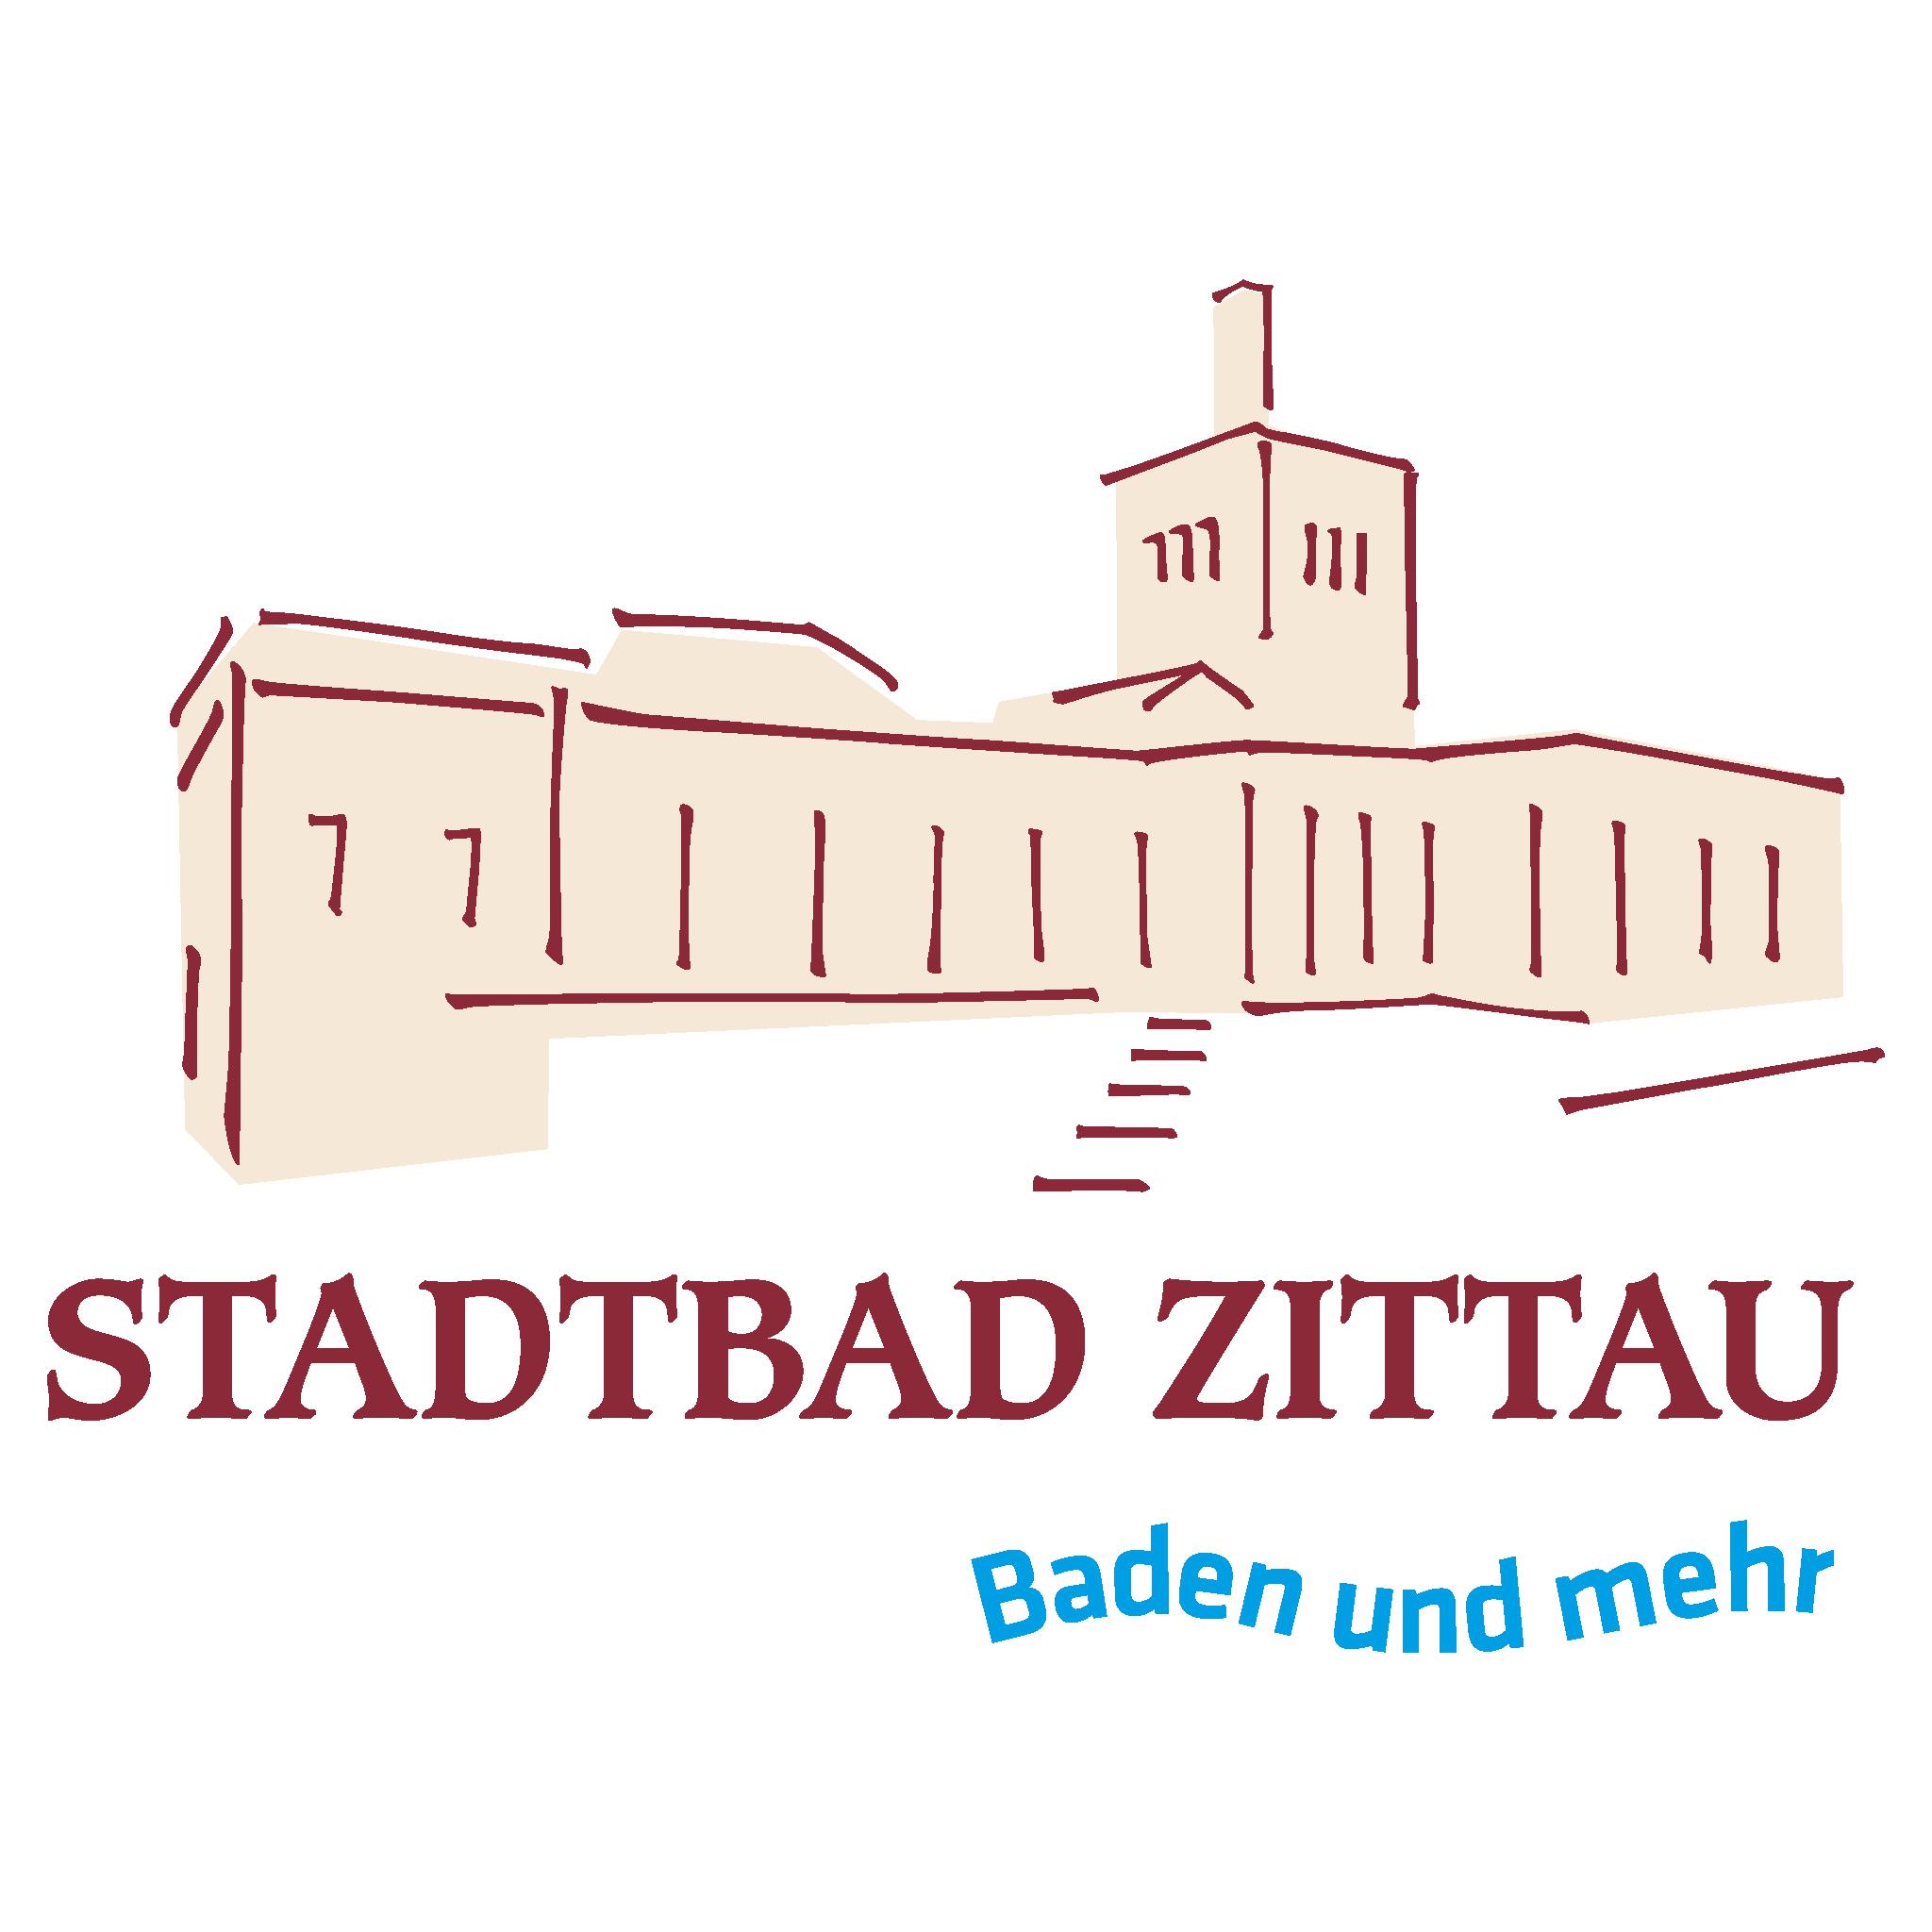 Stadtbad Zittau